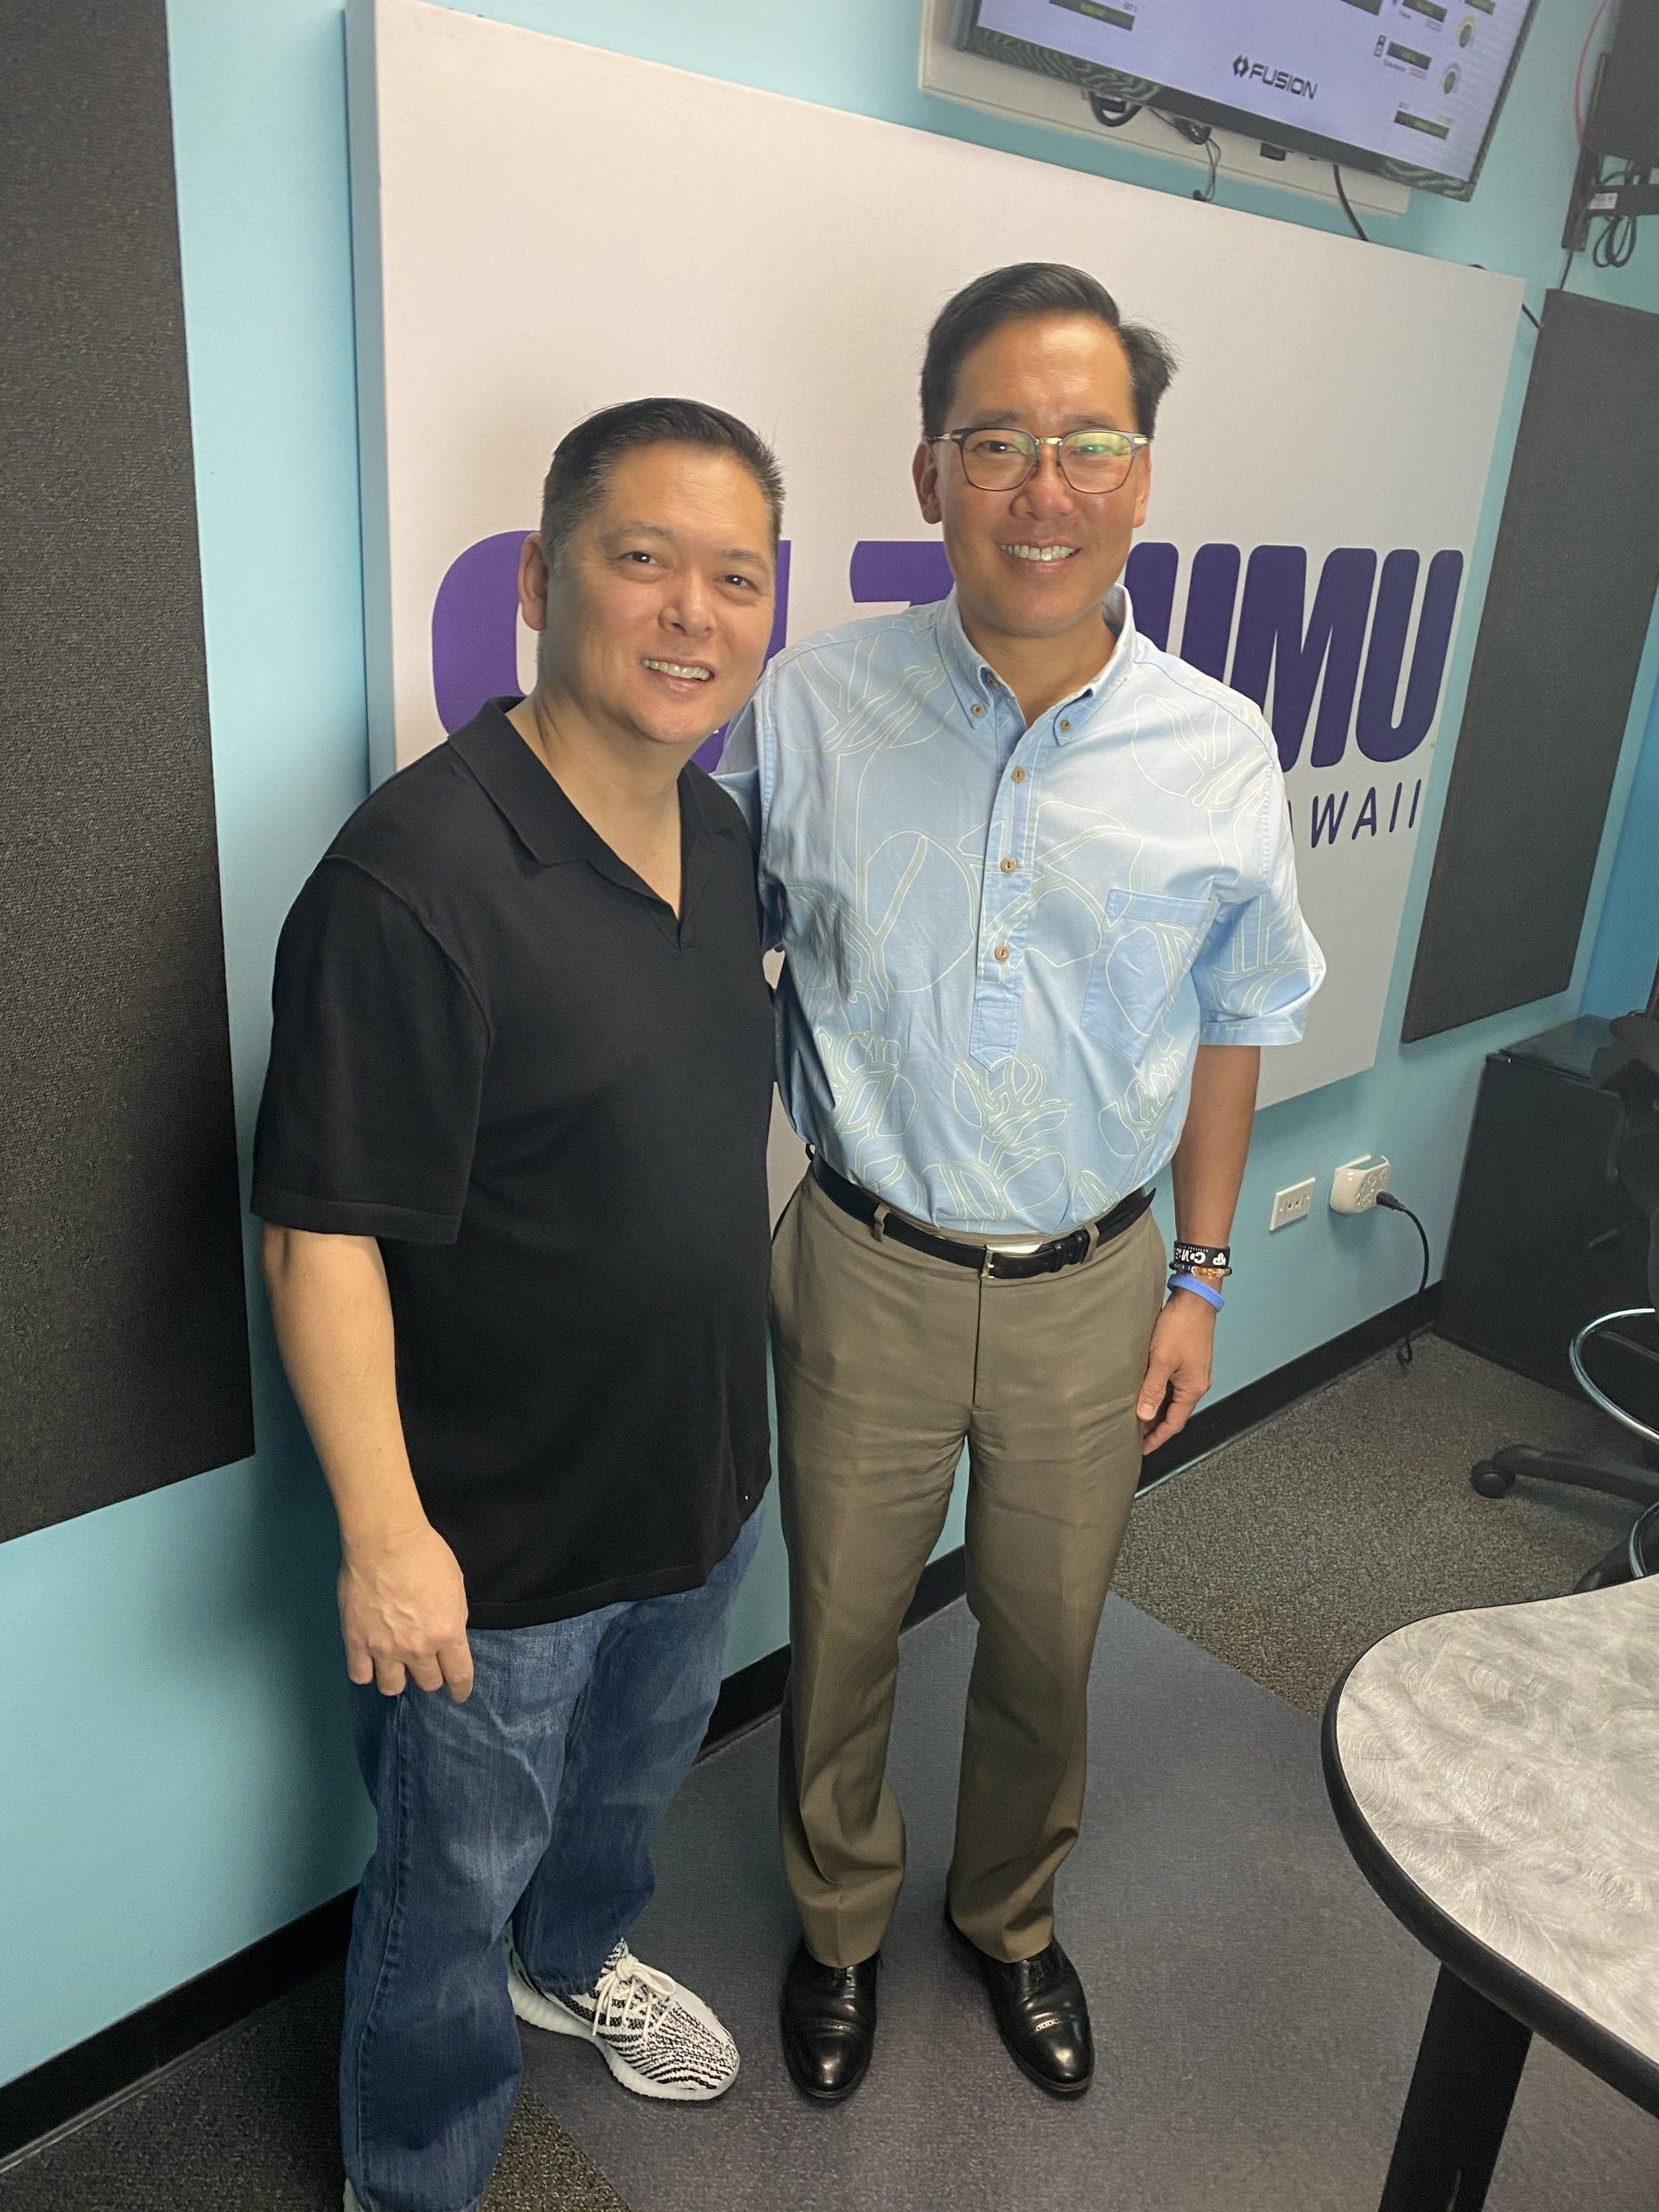 Hawaii Matters Host Devon Nekoba with Mayoral Candidate Keith Amemiya